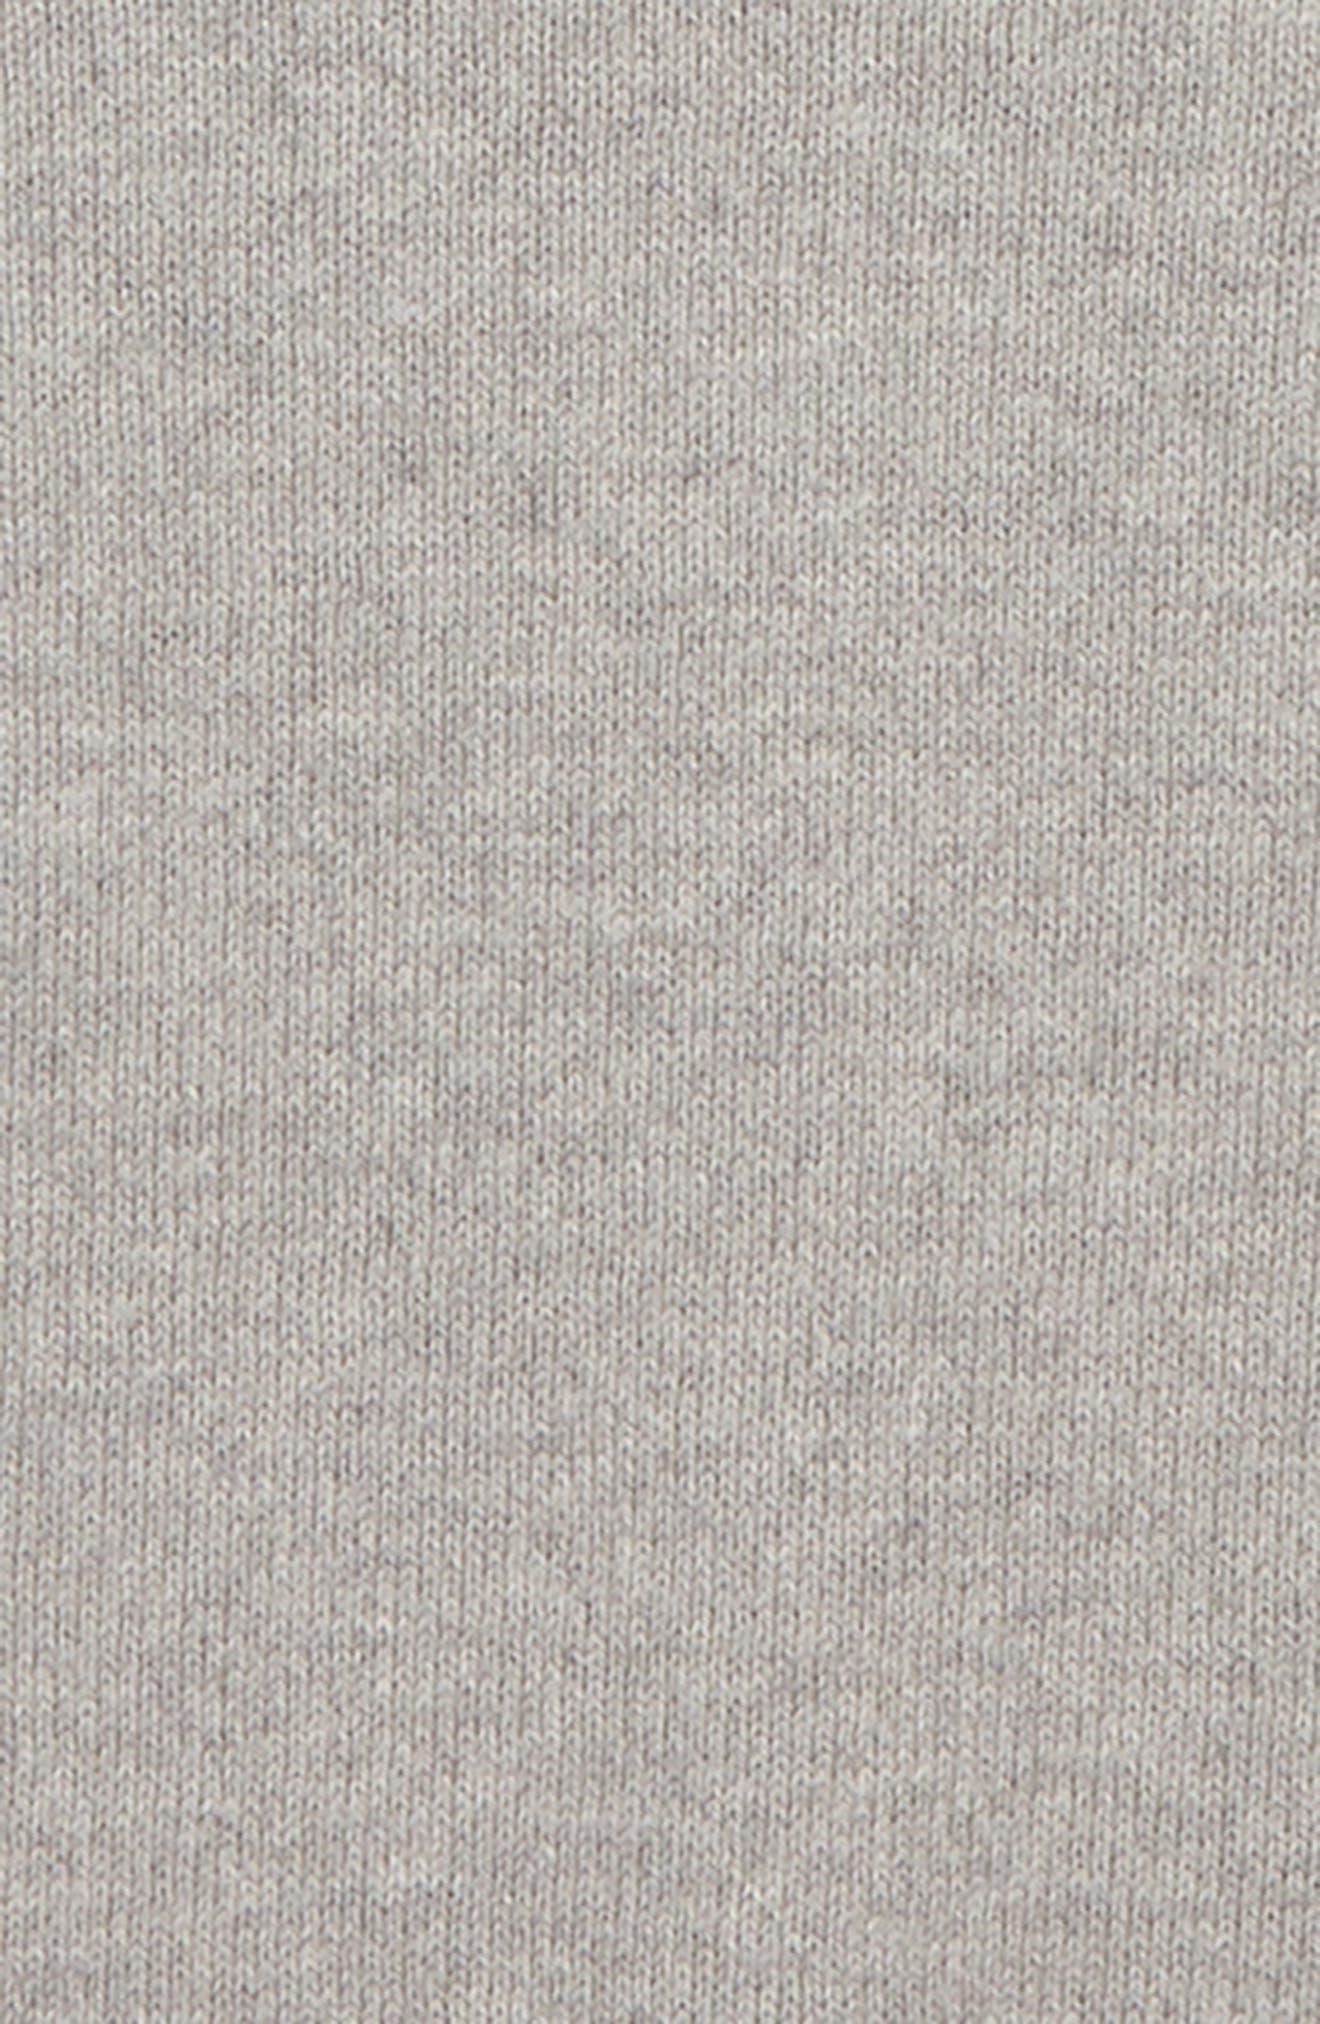 V-Neck Sweater,                             Alternate thumbnail 2, color,                             GREY MEDIUM HEATHER